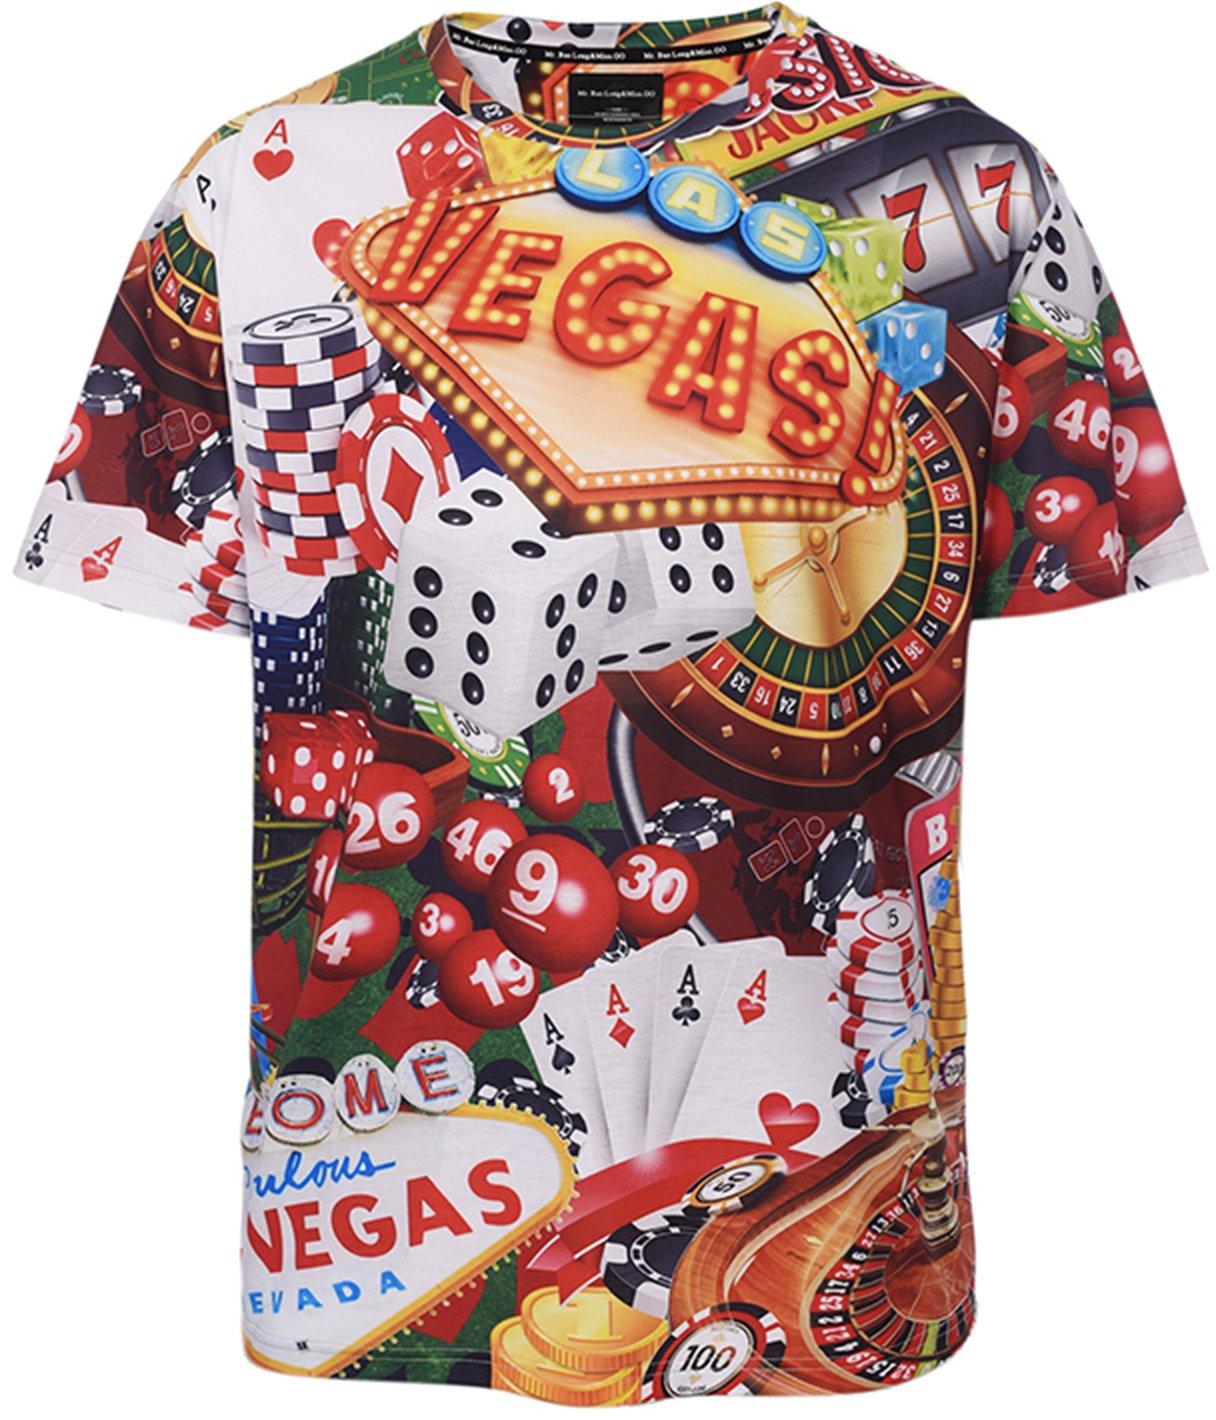 Buy Short Sleeve Las Vegas Unisex T Shirt Now!